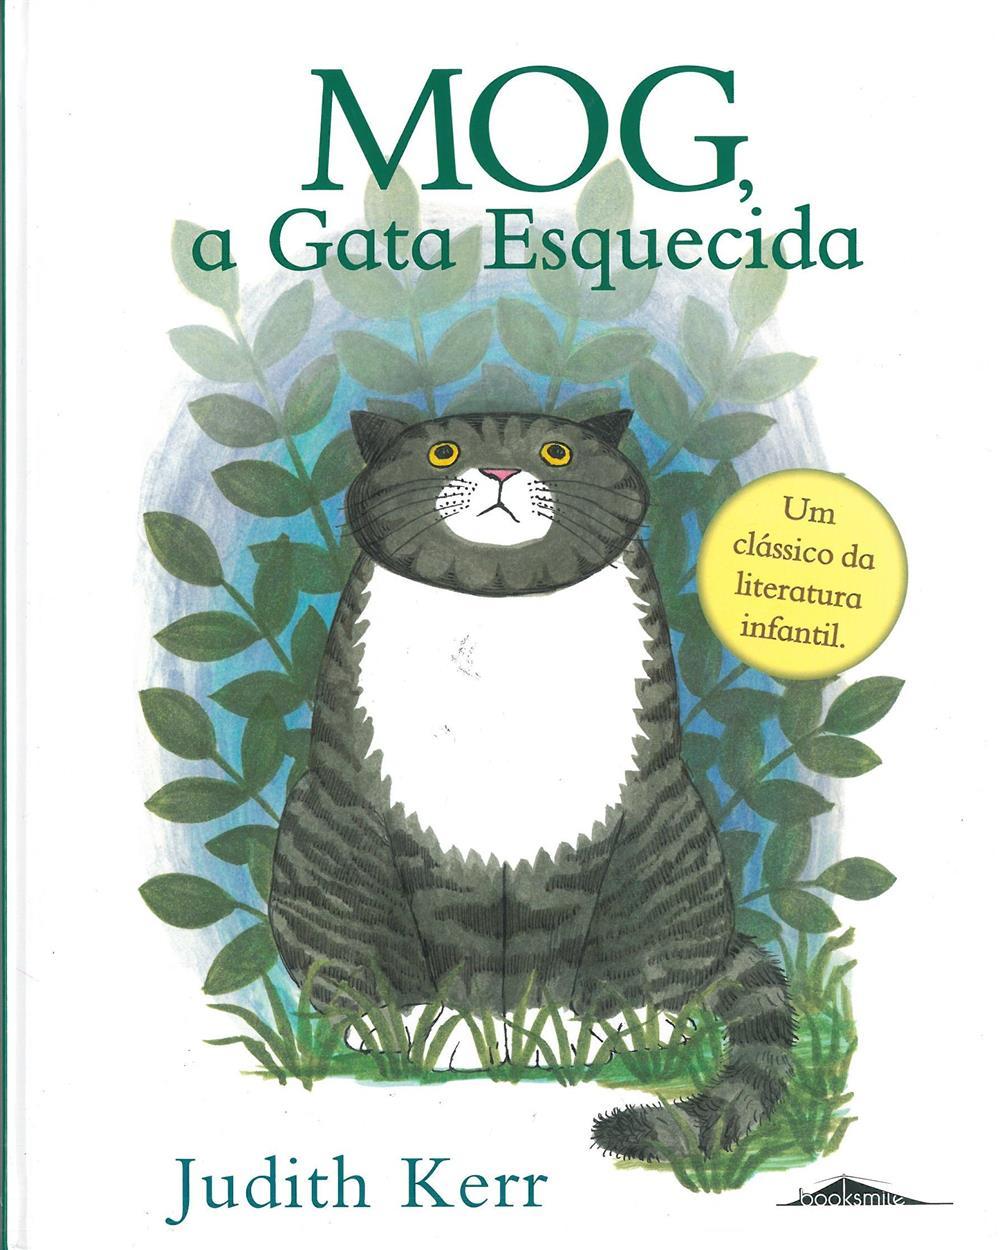 Mog, a gata esquecida_.jpg